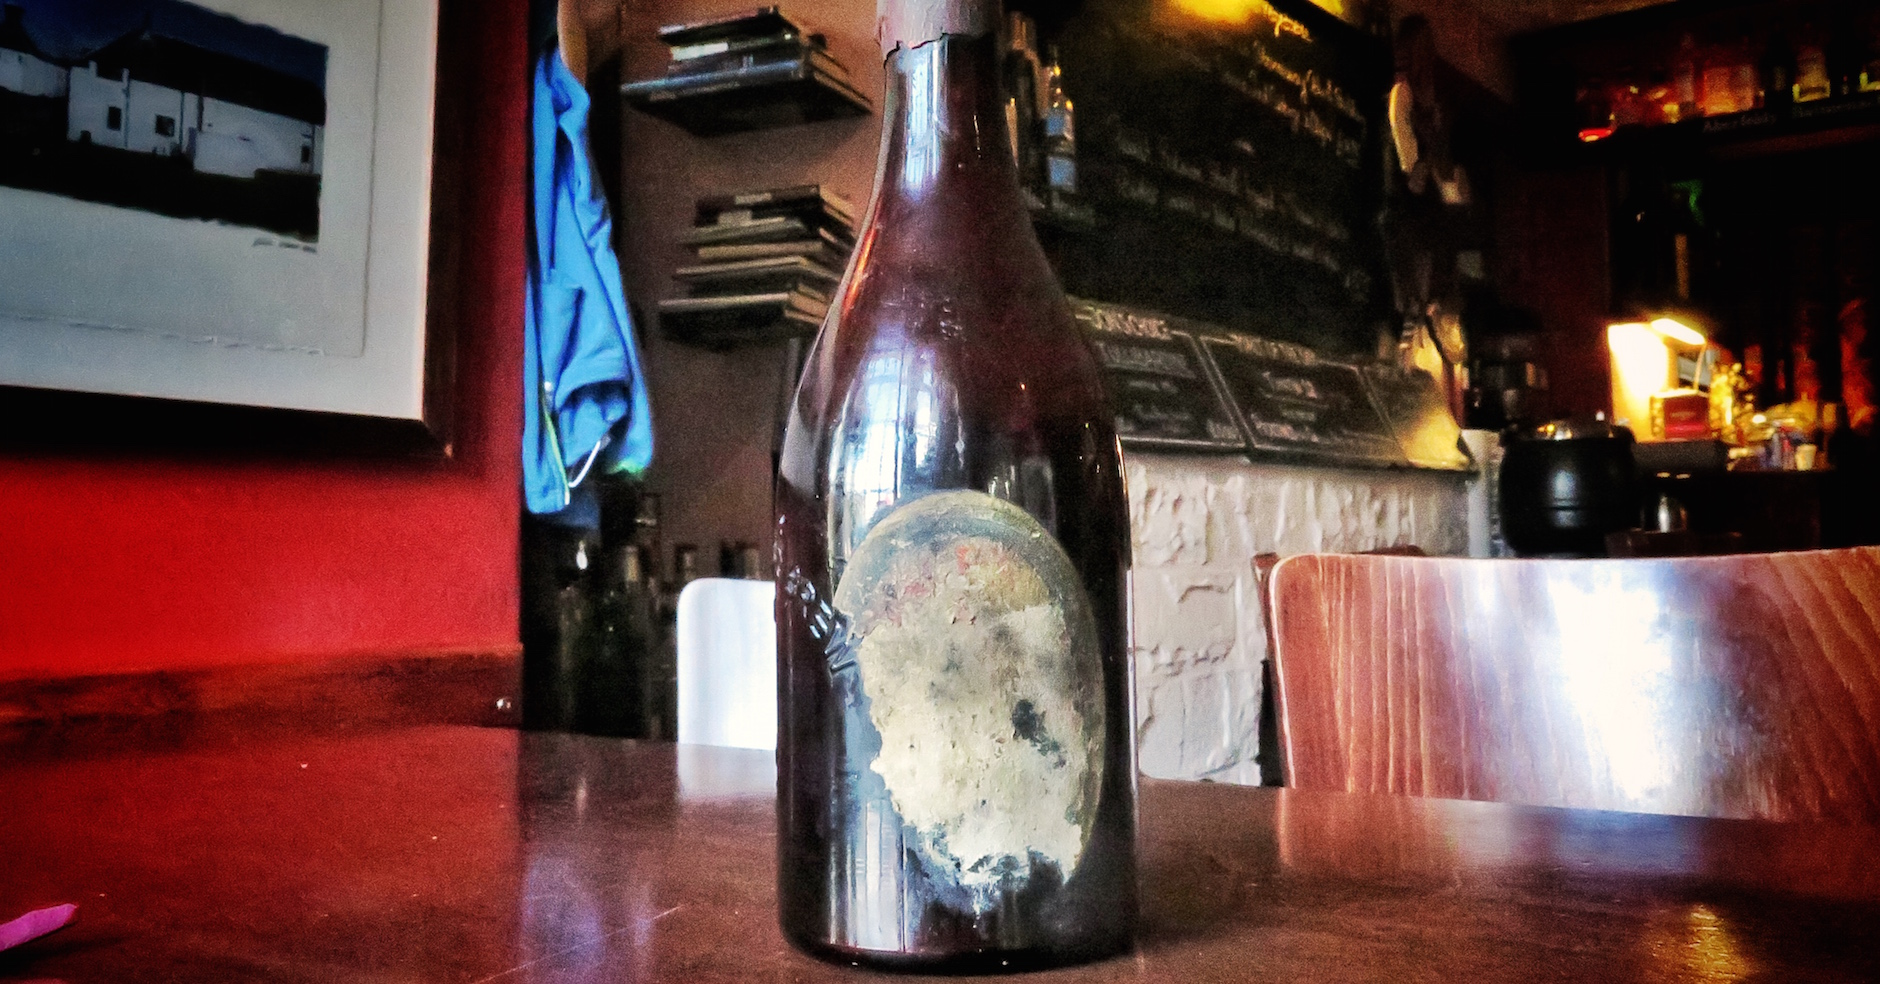 Bass 1929 Prince's Ale